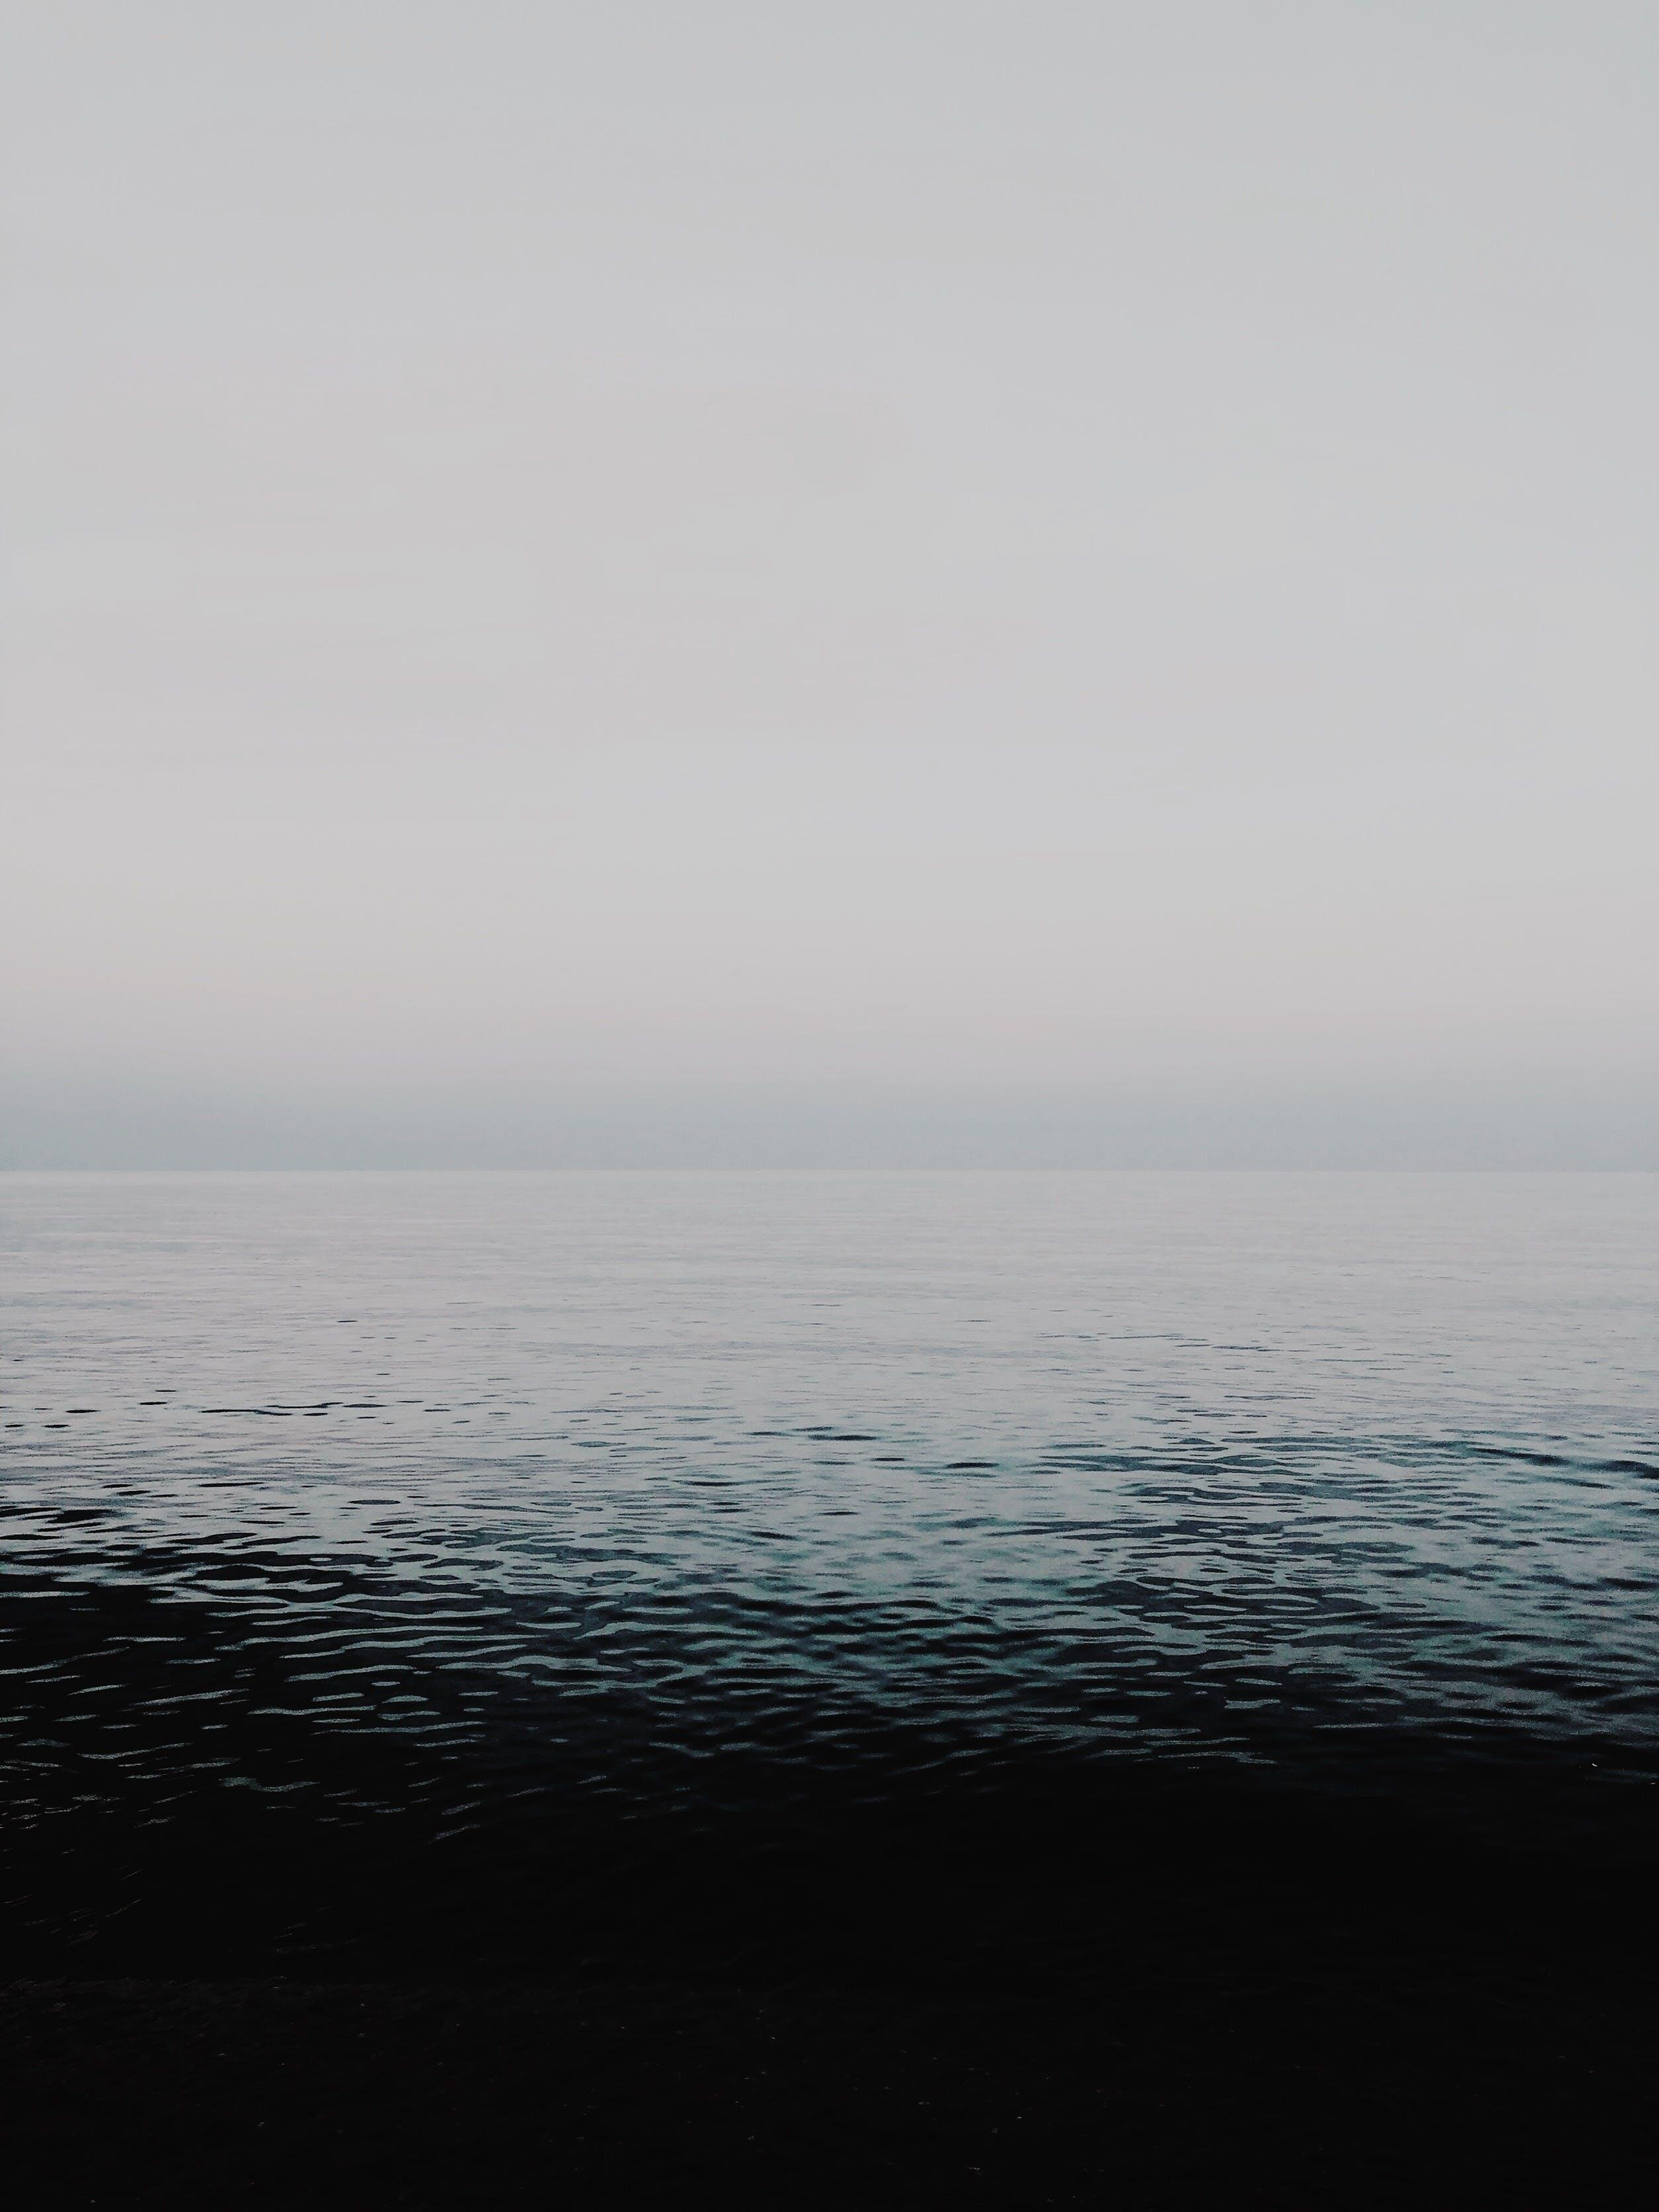 Kostenloses Stock Foto zu bewölkt, draußen, himmel, horizont